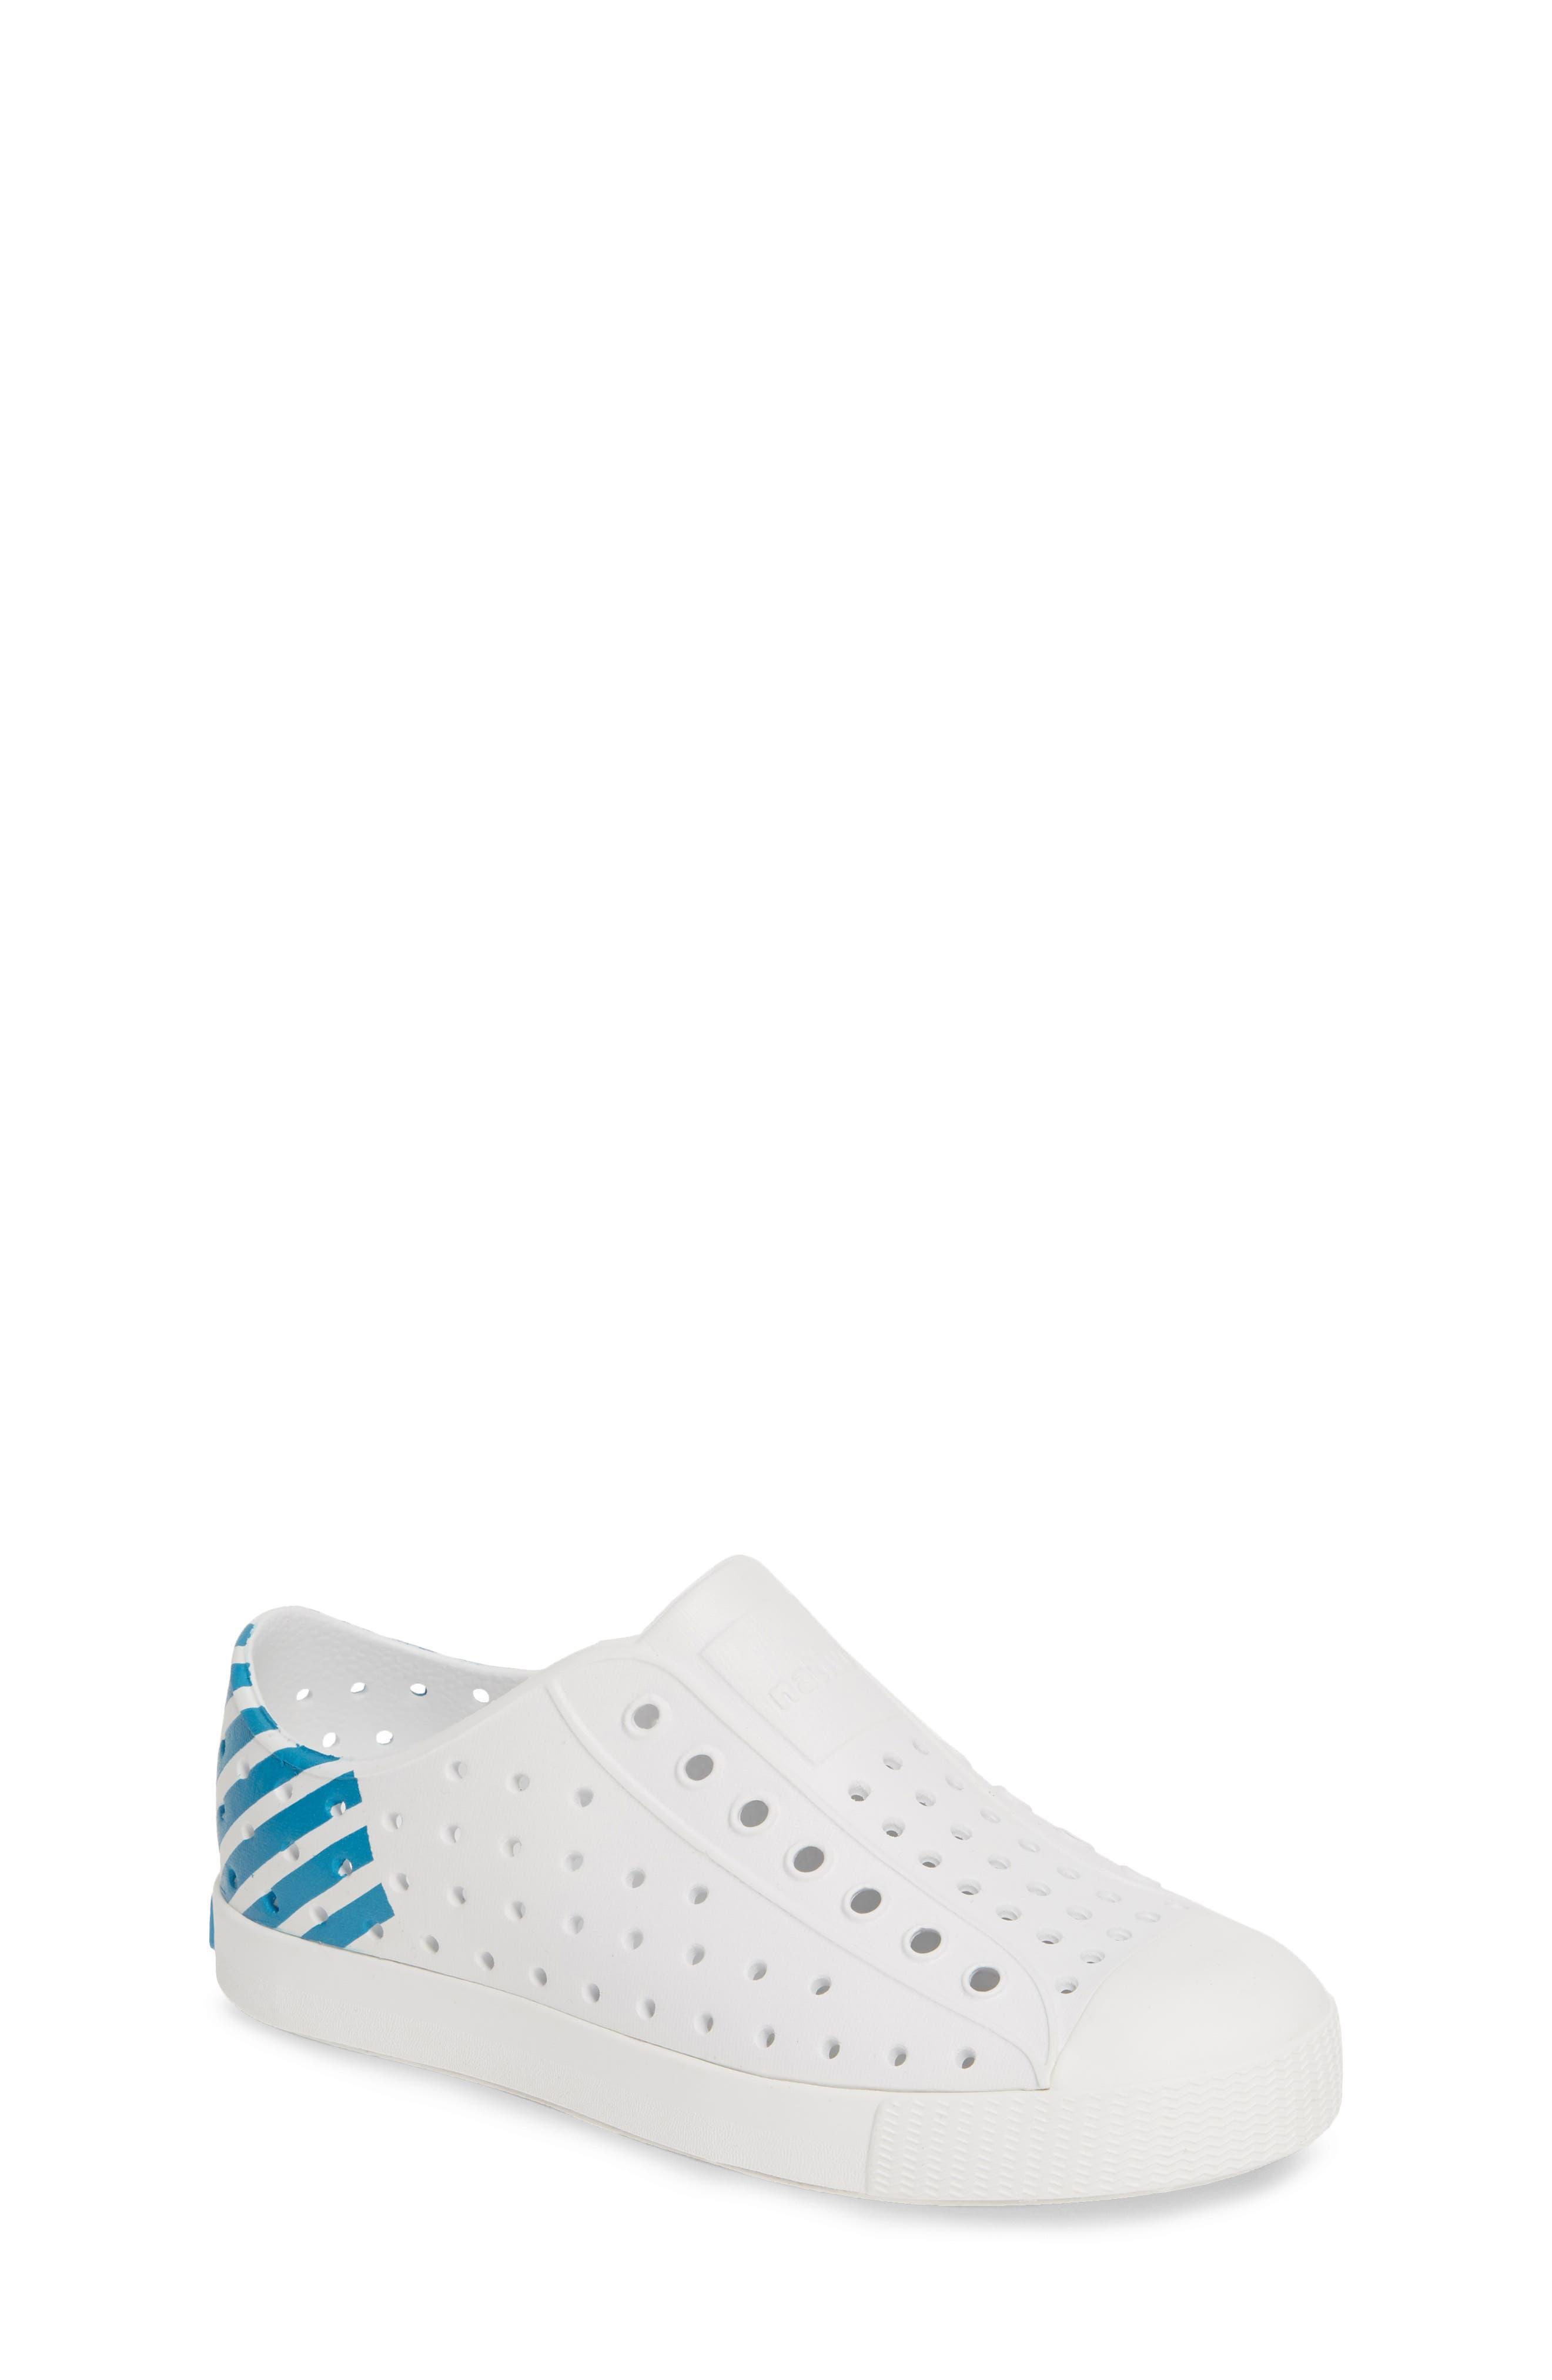 'Jefferson' Water Friendly Slip-On Sneaker, Main, color, WHITE/ WHITE/ ULTRA GLOW BLOCK